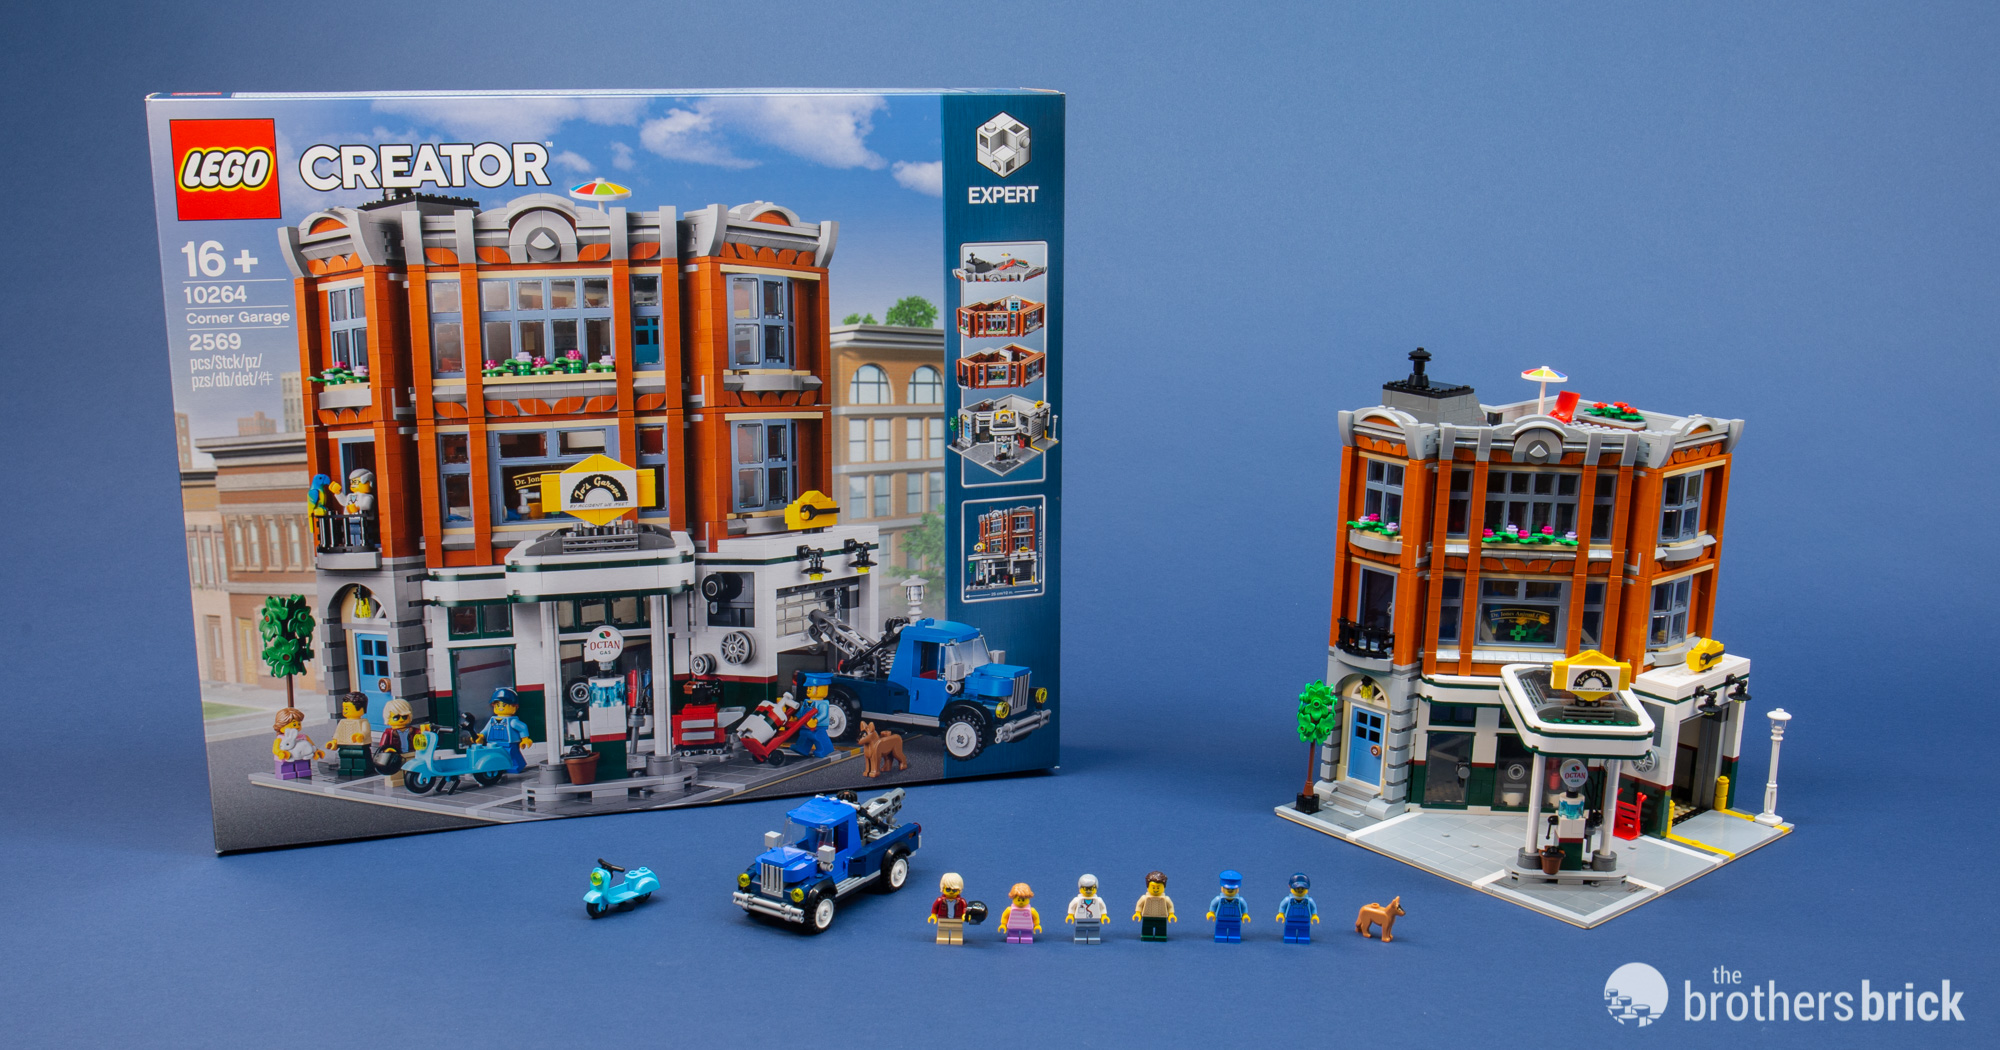 LEGO Creator Expert 10264 Corner Garage [Review] | The